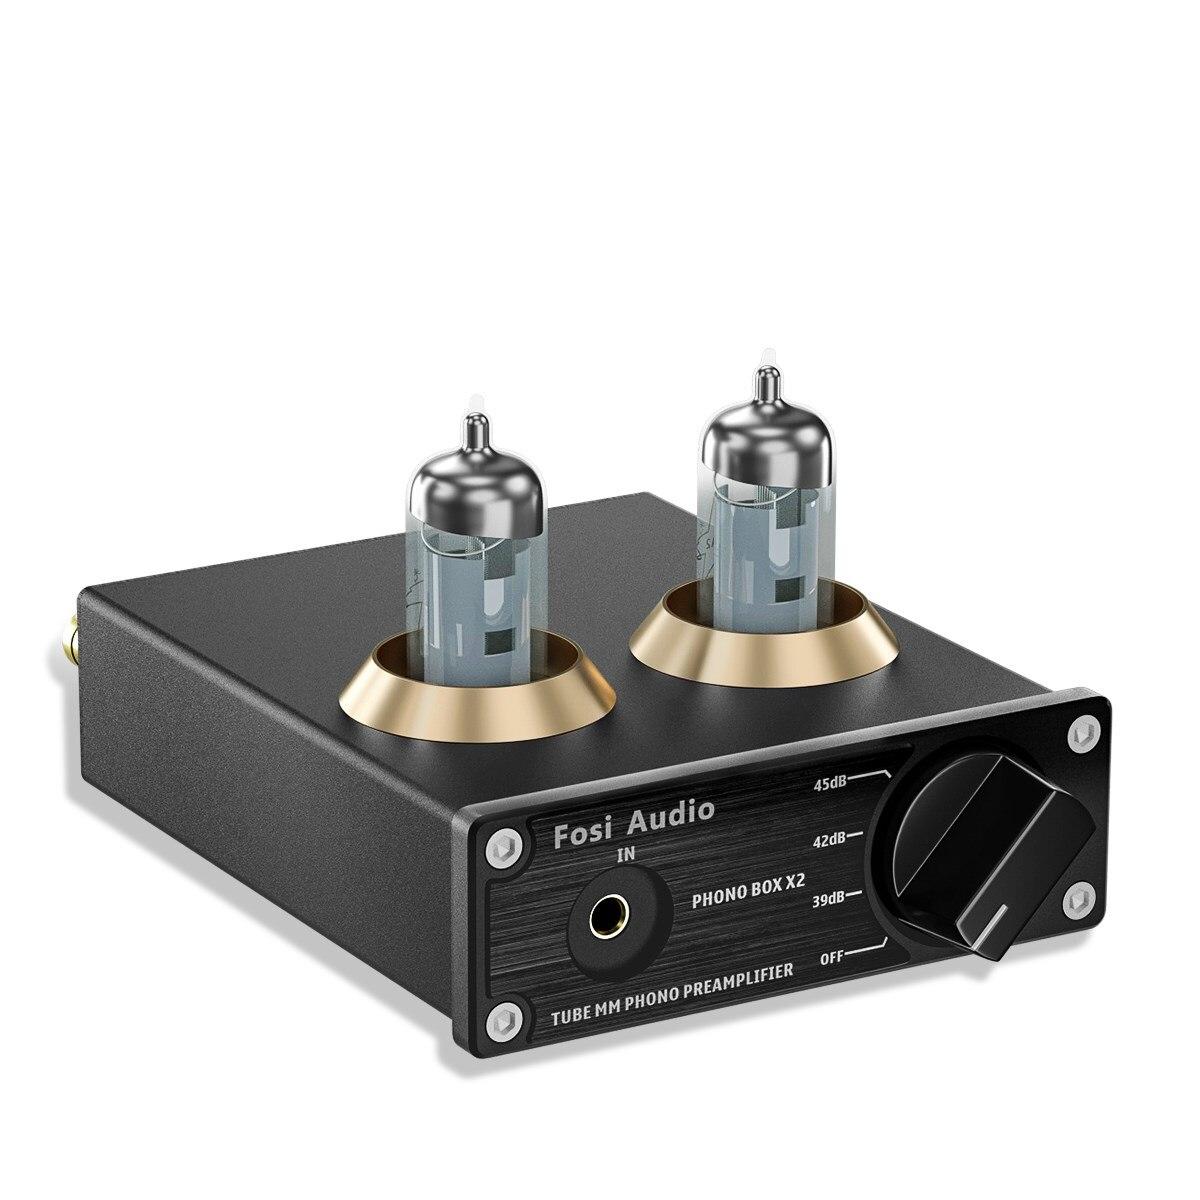 مُضخّم صوت فوسي صوتي فونوغراف فونو بريمب لصوت ستيريو صغير قابل للدوران HiFi مُضخّم صوت فارغ مع 5654